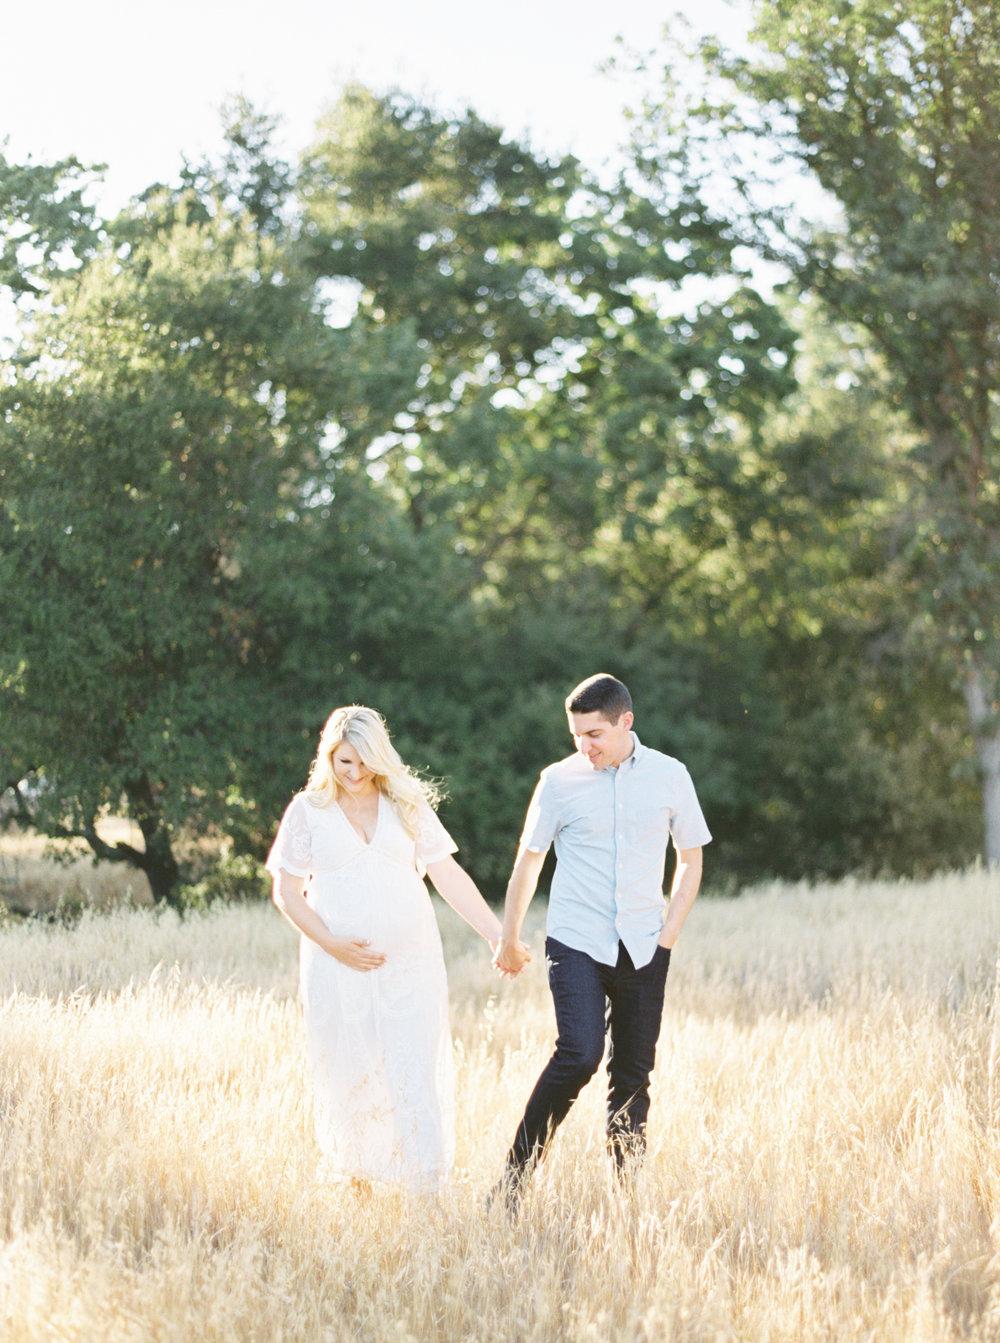 Rachel Owens Photography - Malibu Creek - Film Photography-7.jpg